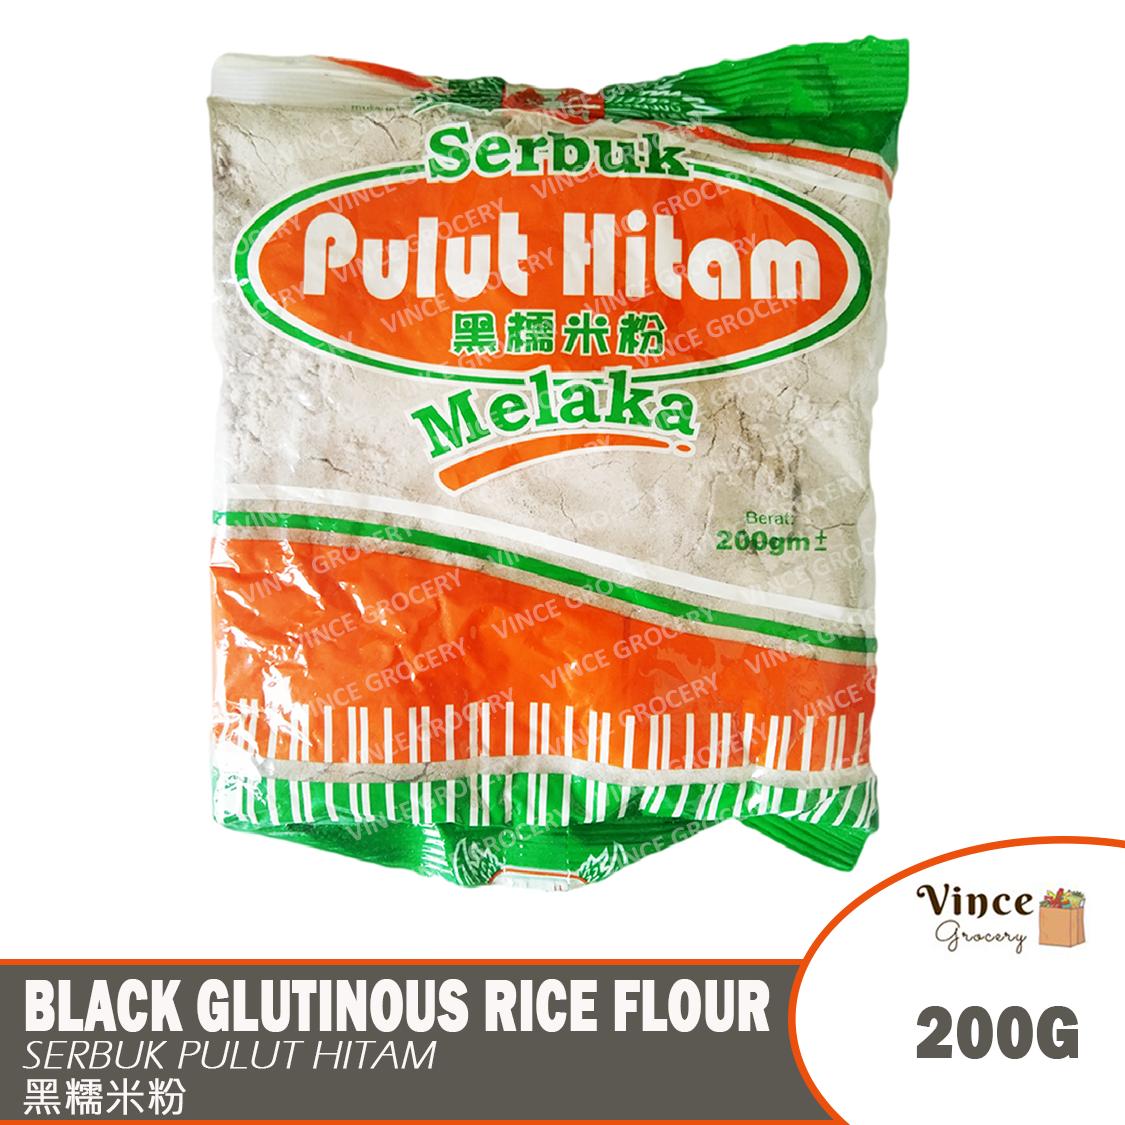 image of KCH Black Glutinous Rice Powder | Serbuk Pulut Hitam | 黑糯米粉 200G